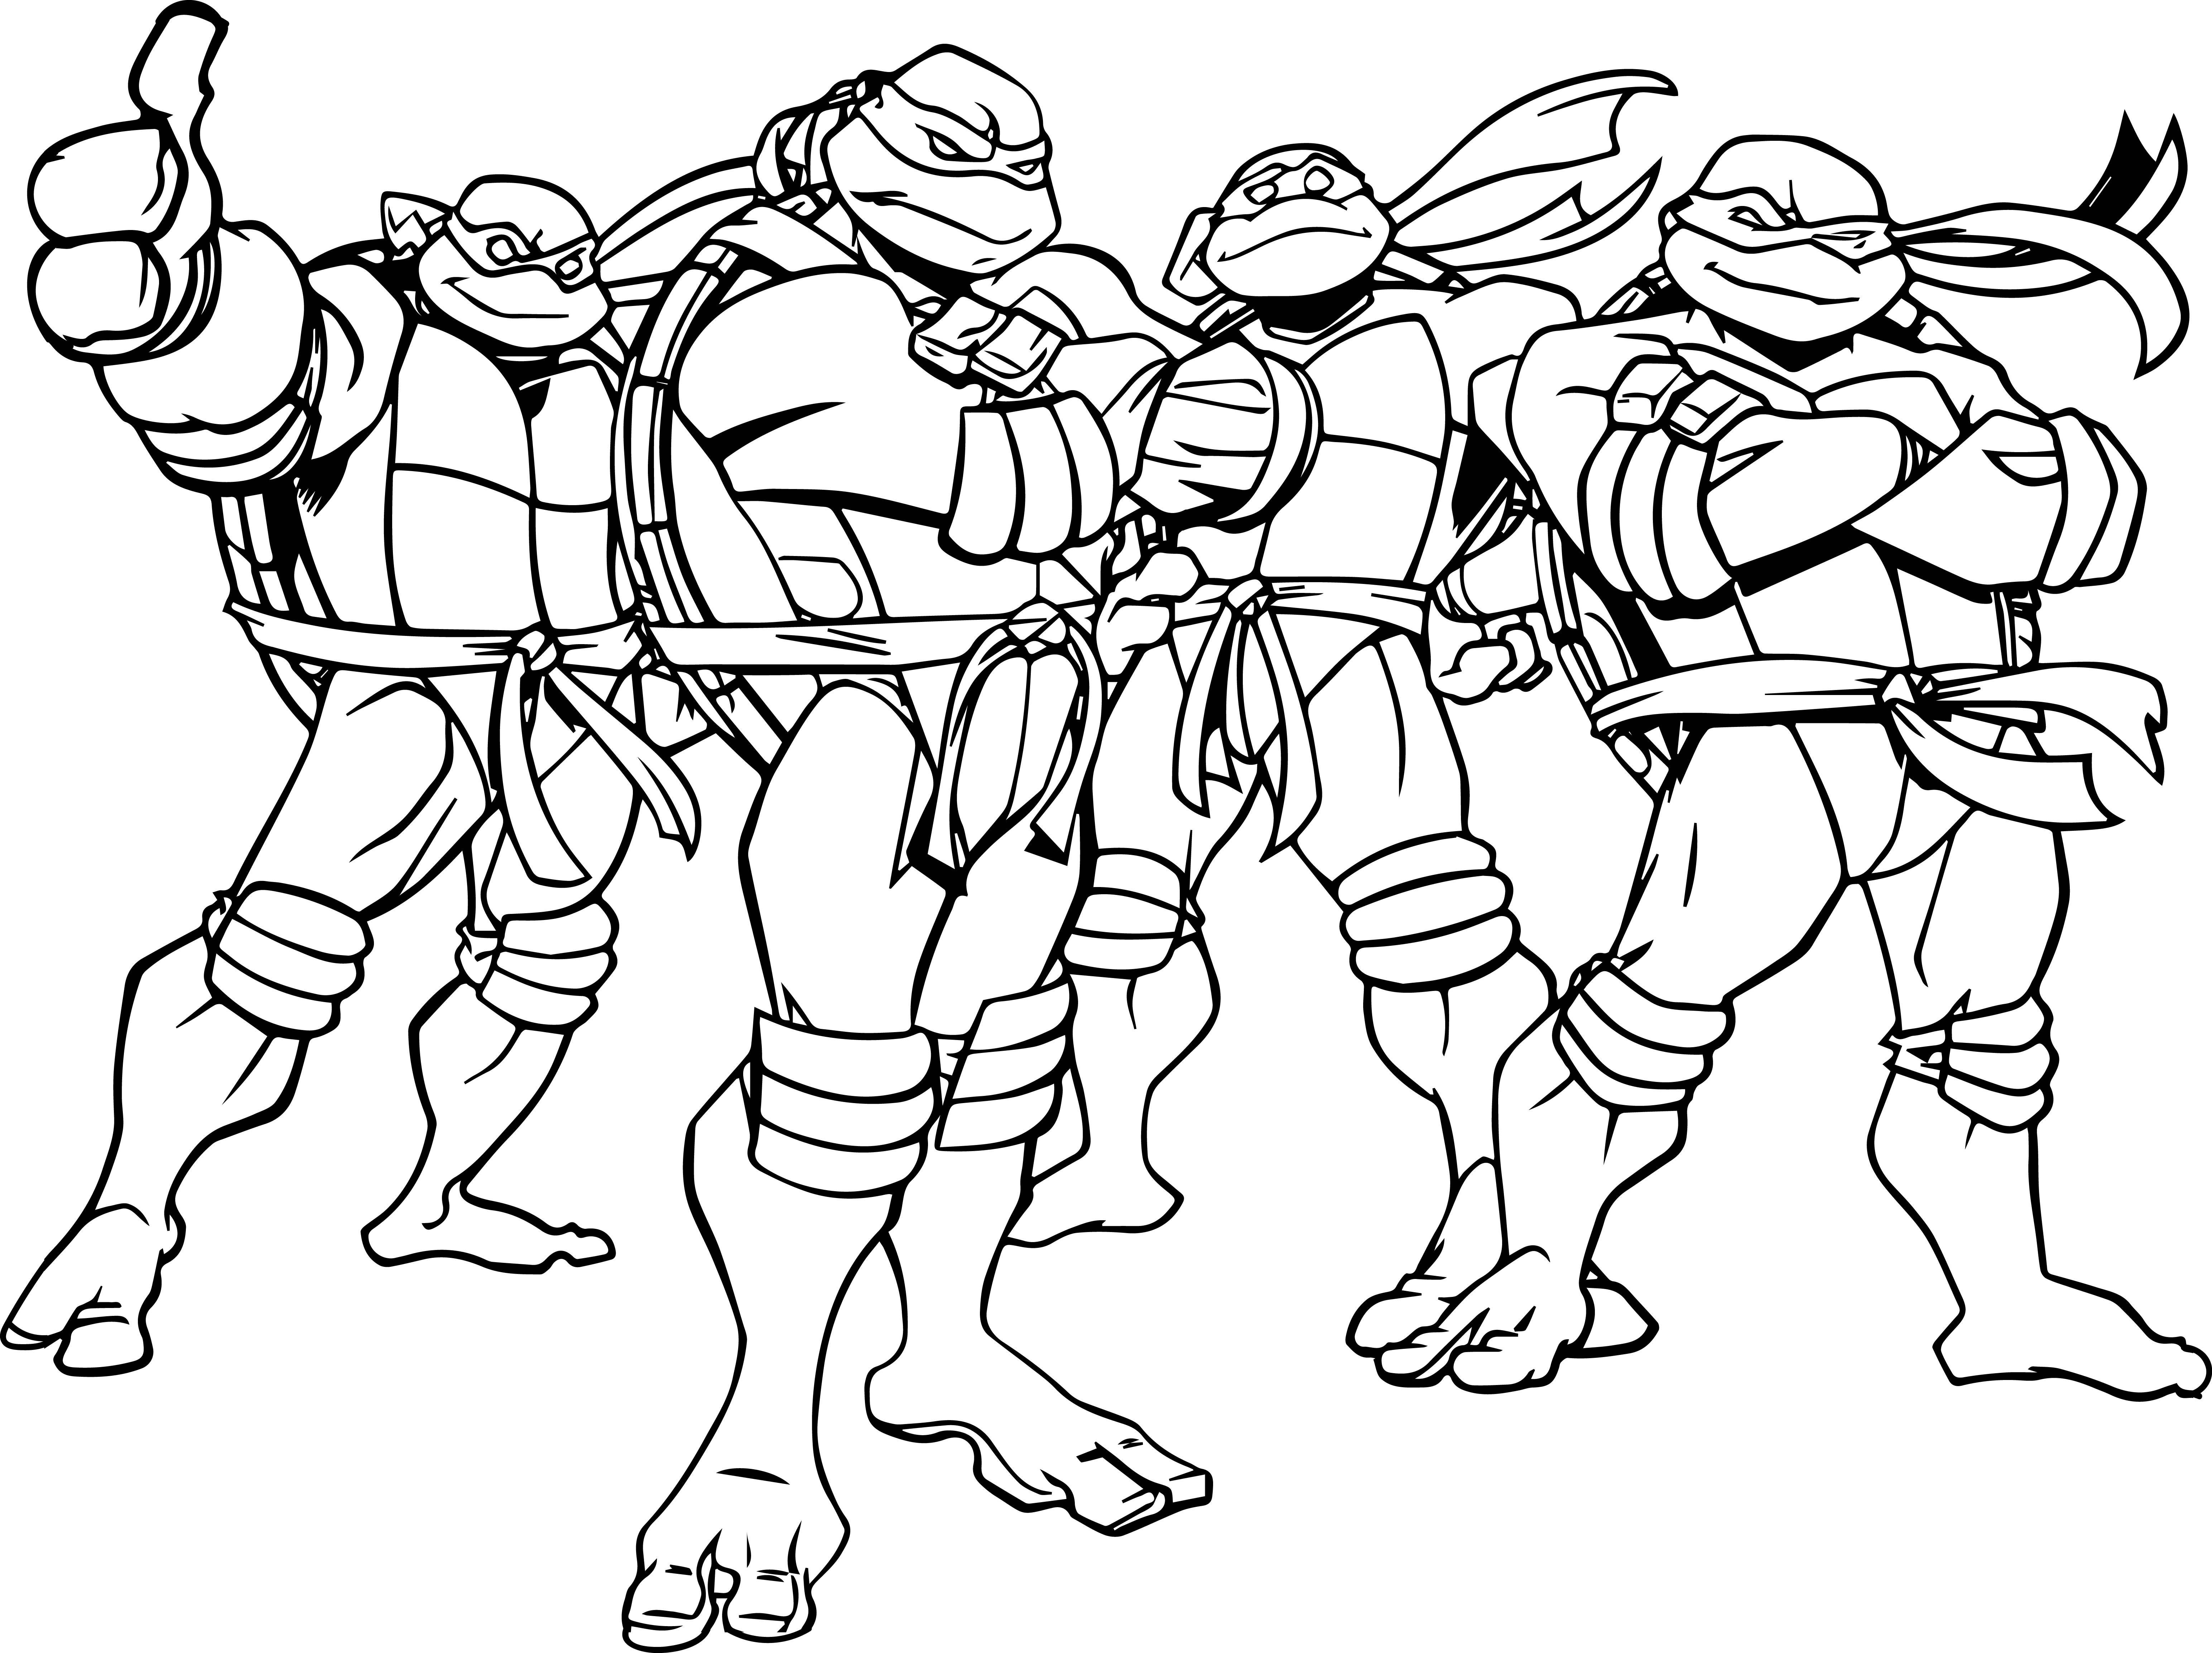 Michelangelo Ninja Turtle Coloring Page